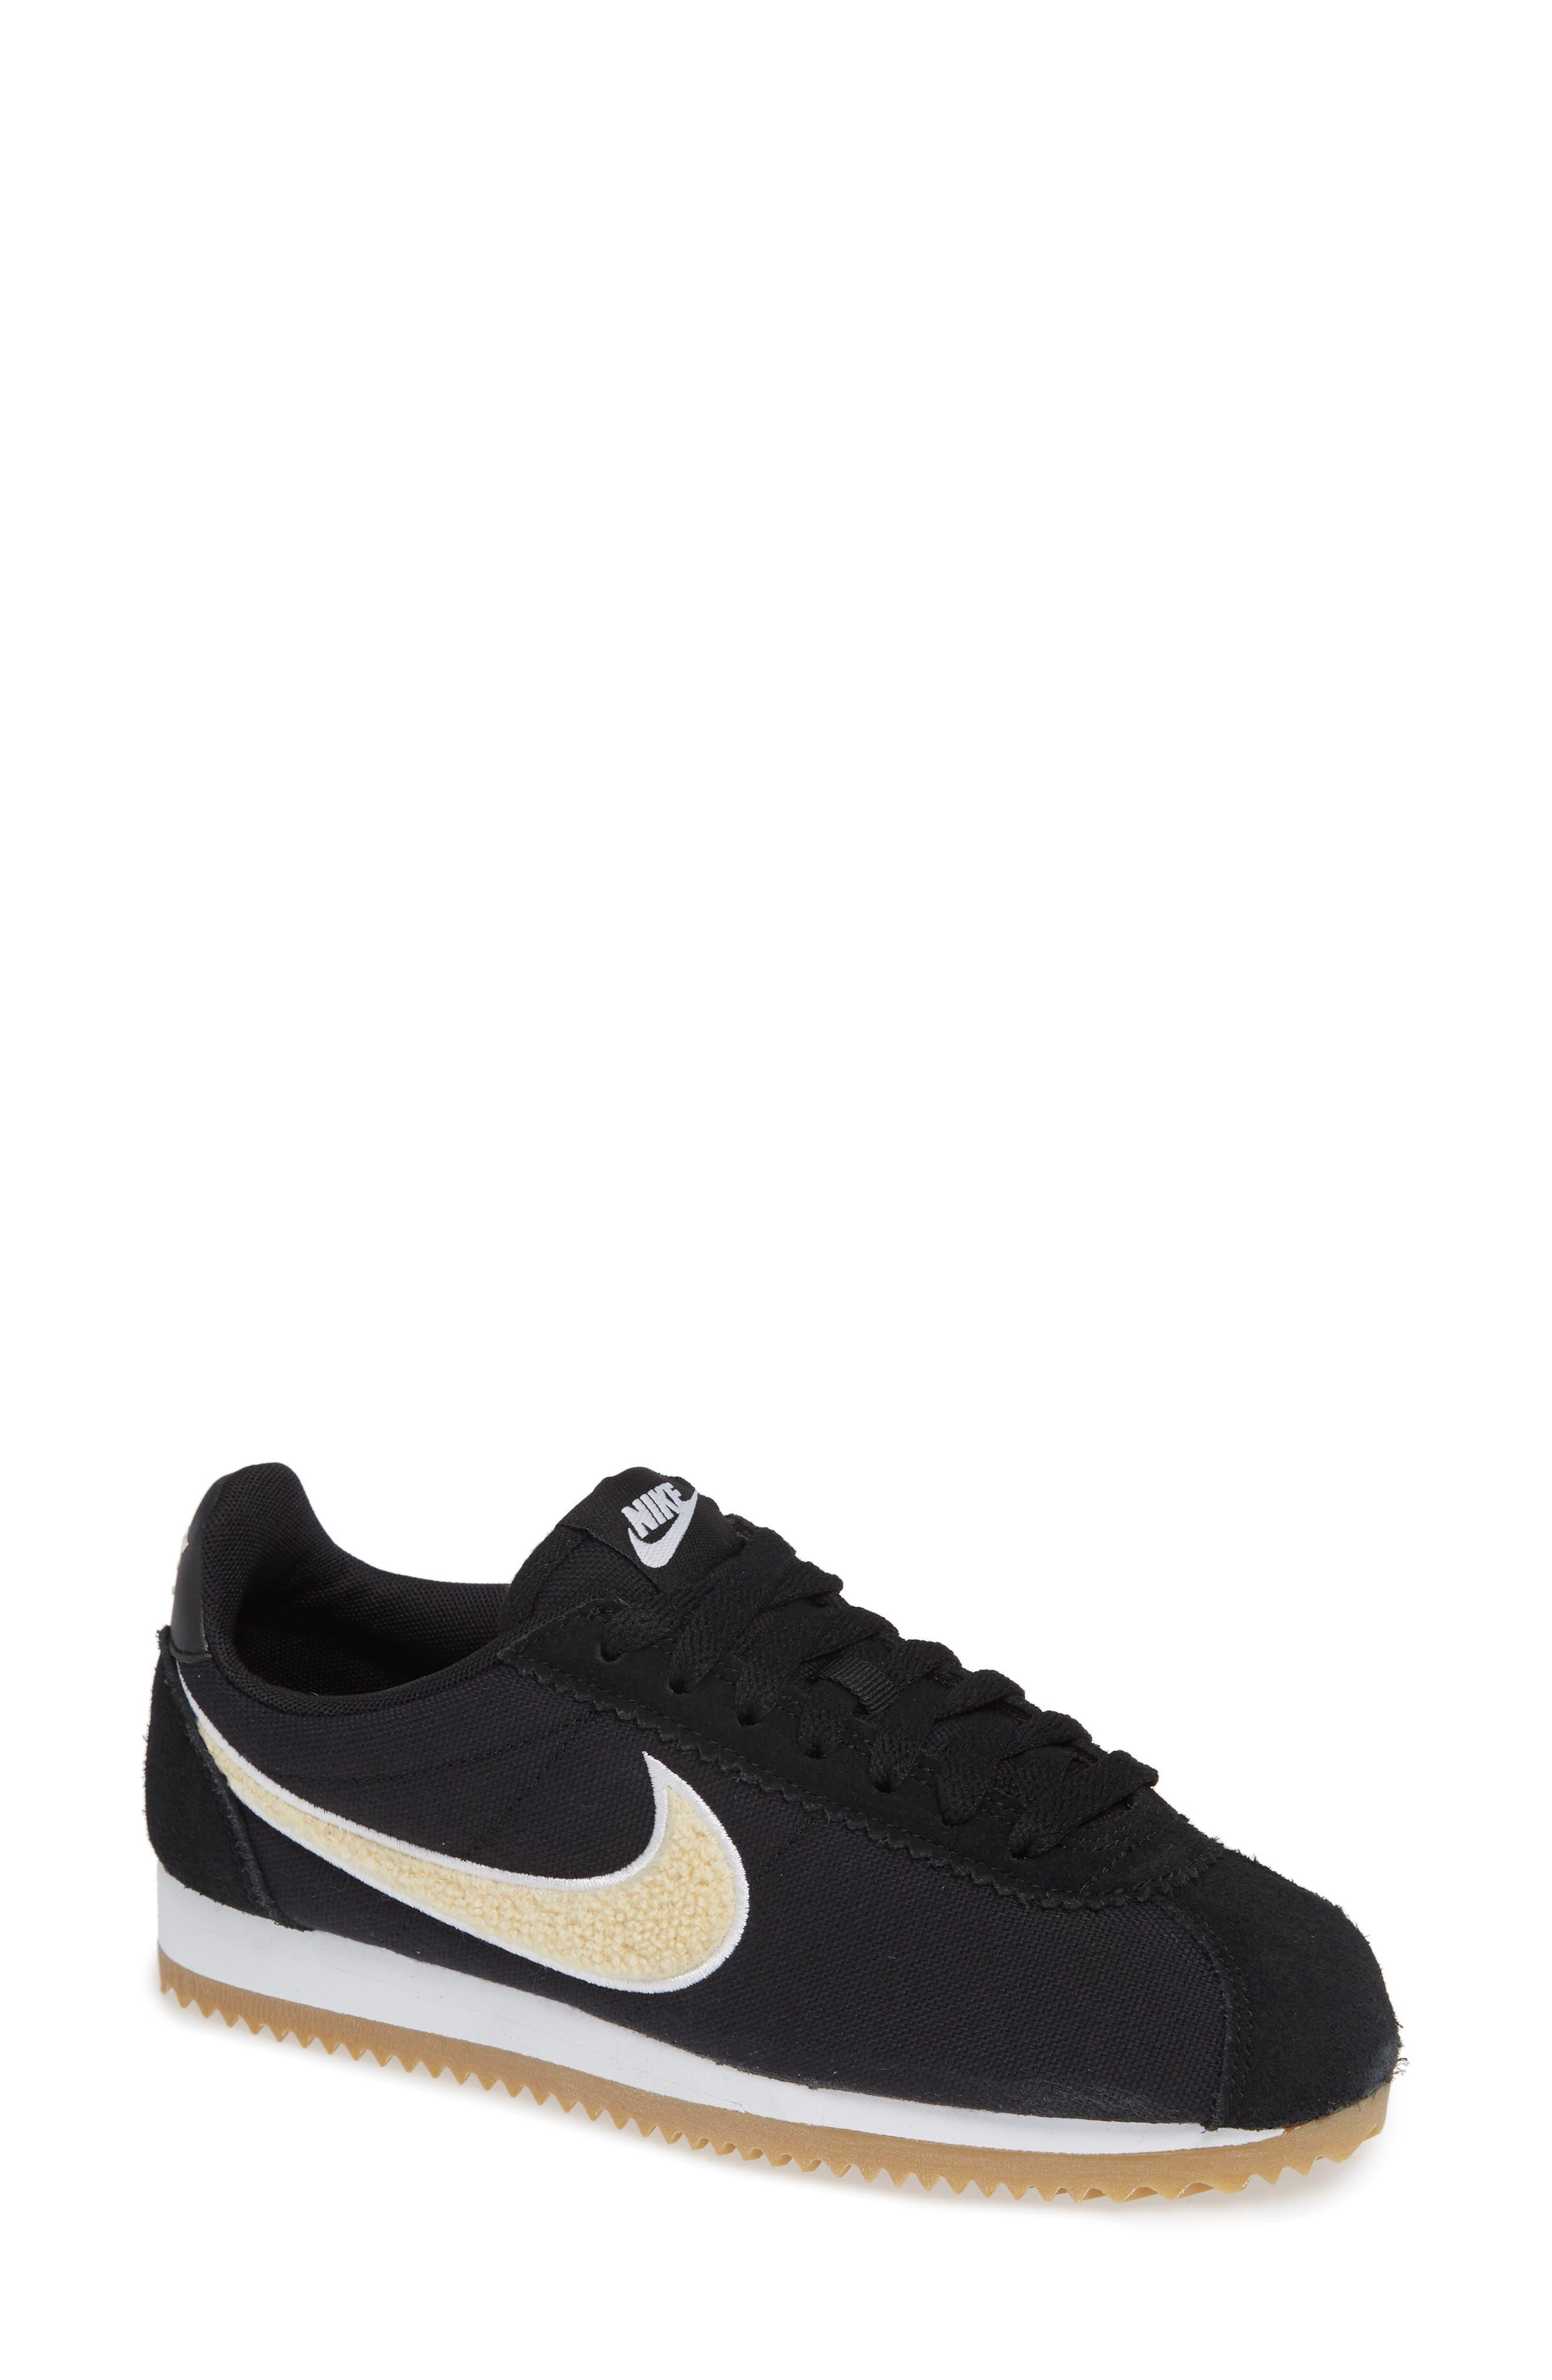 Classic Cortez Premium XLV Sneaker,                             Main thumbnail 1, color,                             Black/ Light Cream/ Brown